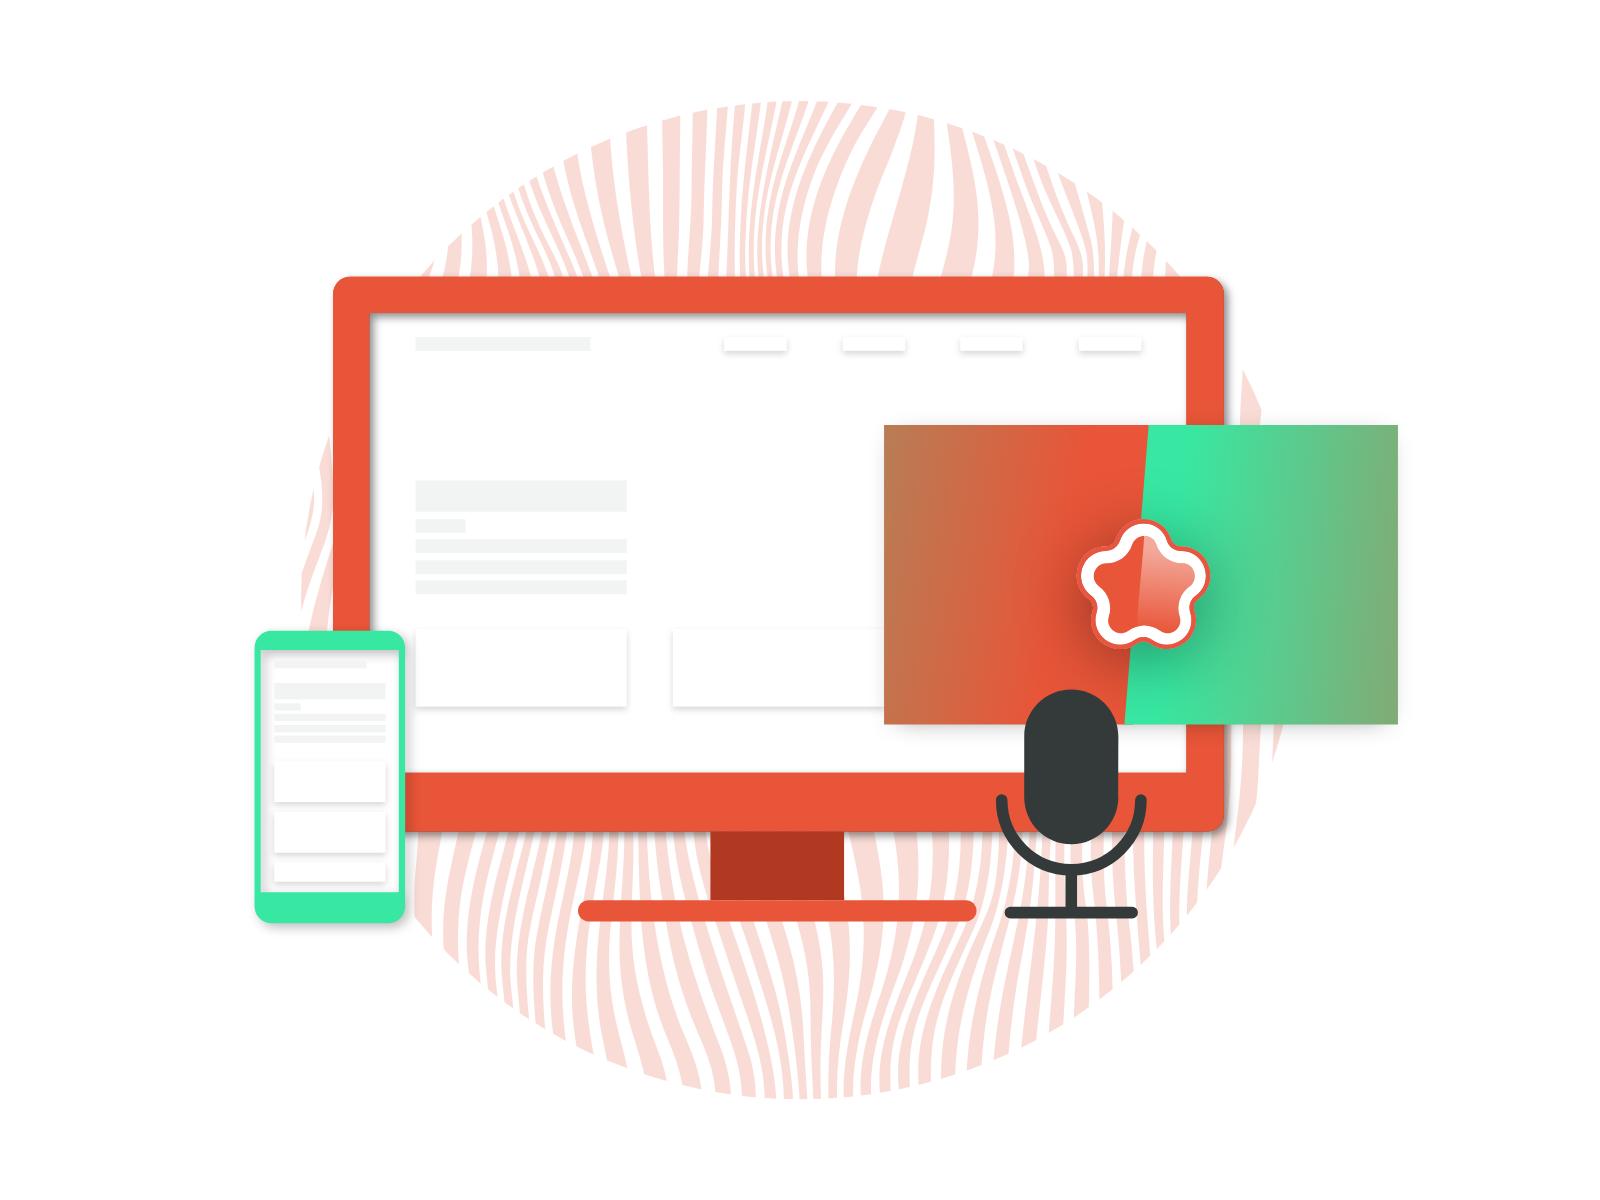 UX UI Design Trends | Kanuka Digital